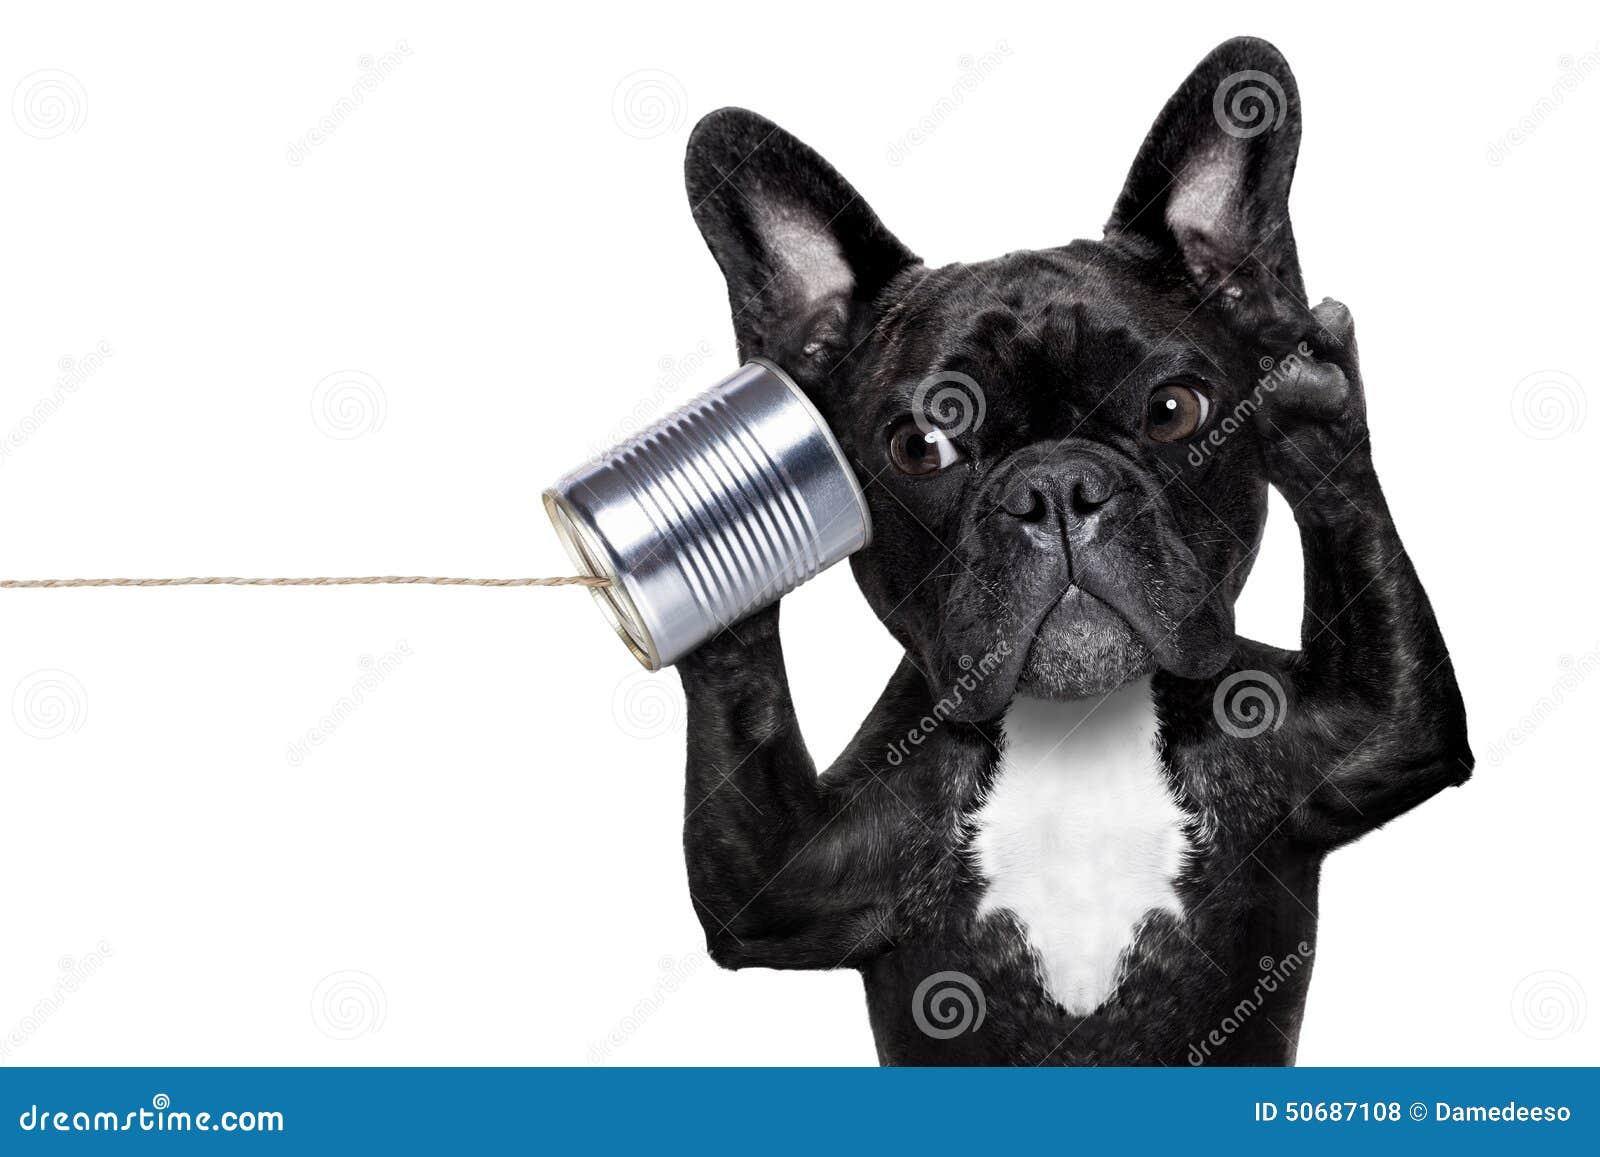 Download 狗电话telpehone 库存照片. 图片 包括有 宠物, 闲话, 查出, 敌意, 牛头犬, 声明, 求知欲 - 50687108